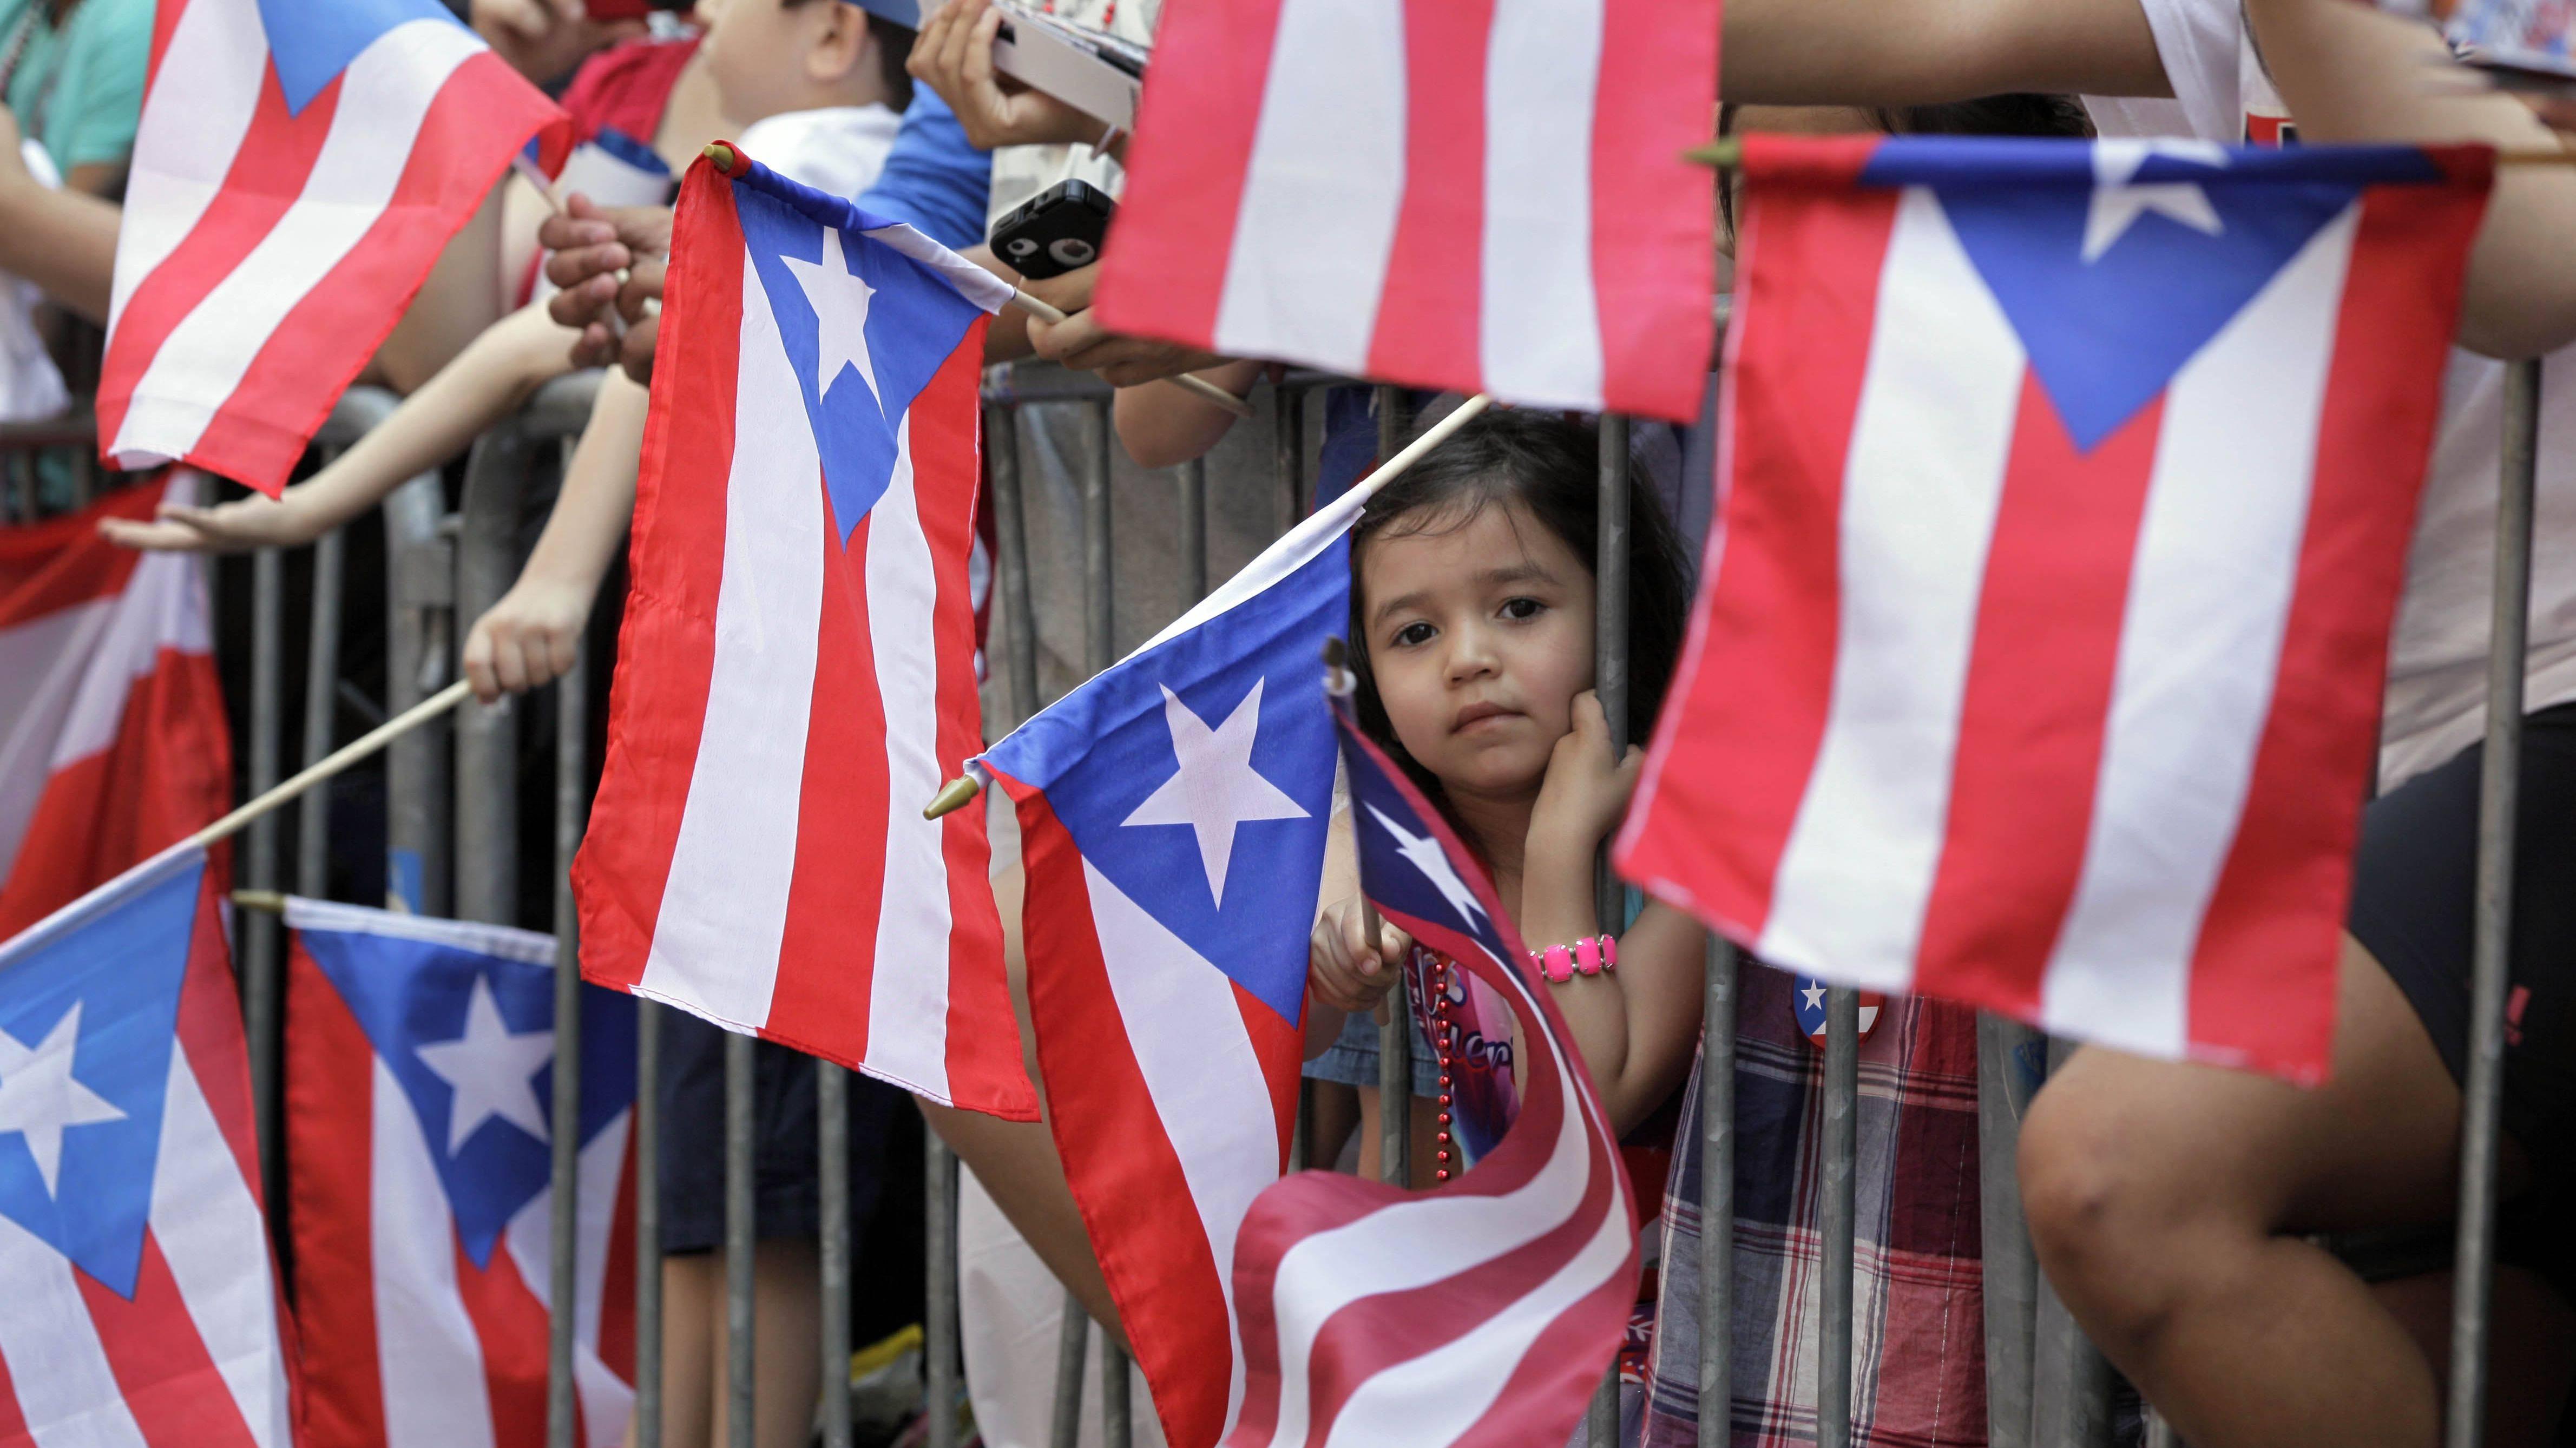 puertoricandayparade-c8e9a56b797cf79d4d9643cb17493c52.jpg